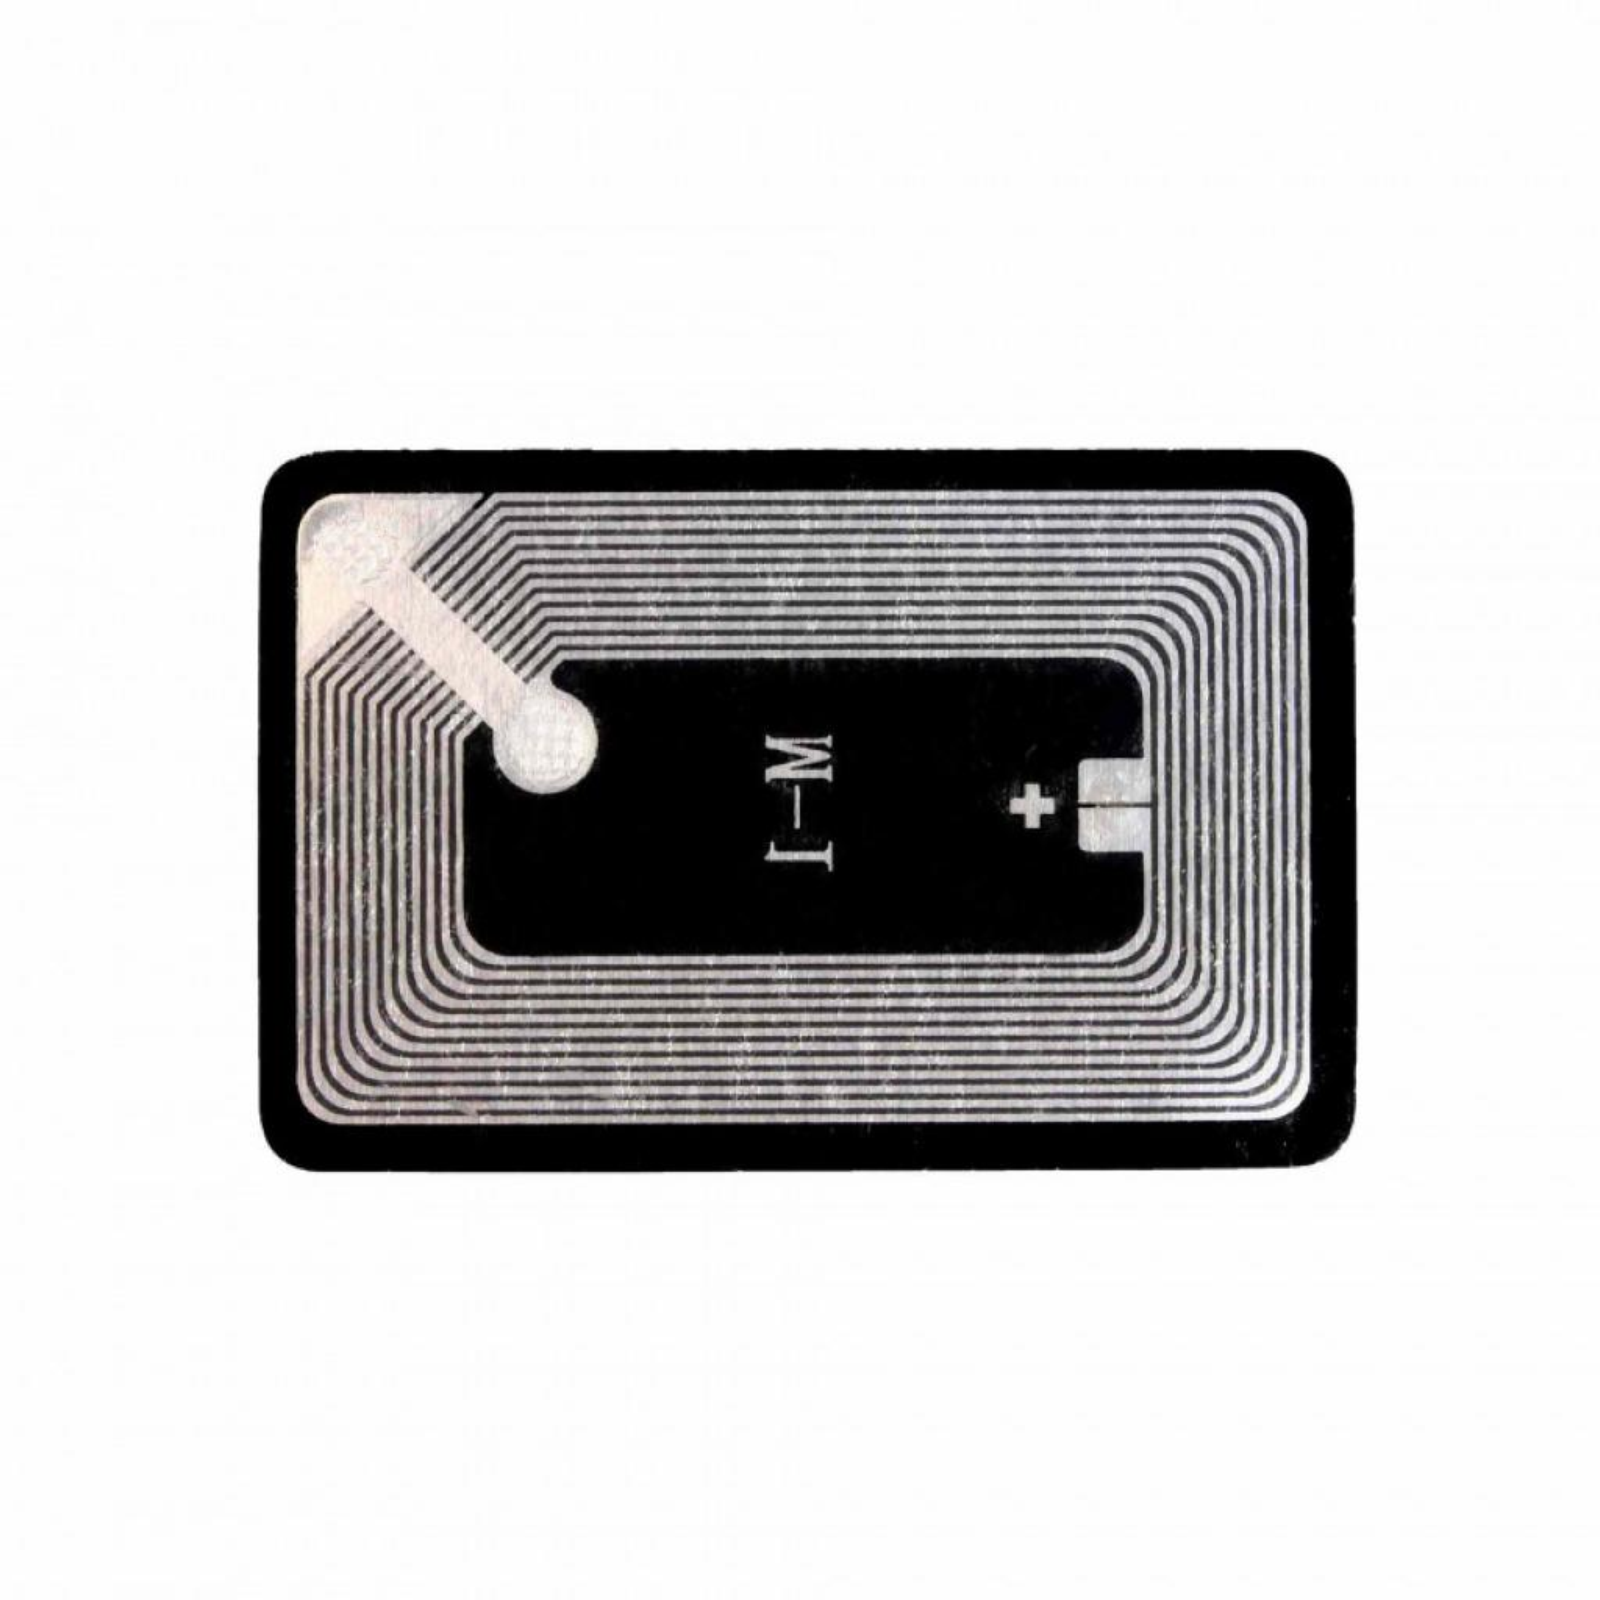 Чип для картриджа KyoceraFS-1028 (TK-130) (EU/MEA) 7.2k Static Control (TK130CHIP-EU)